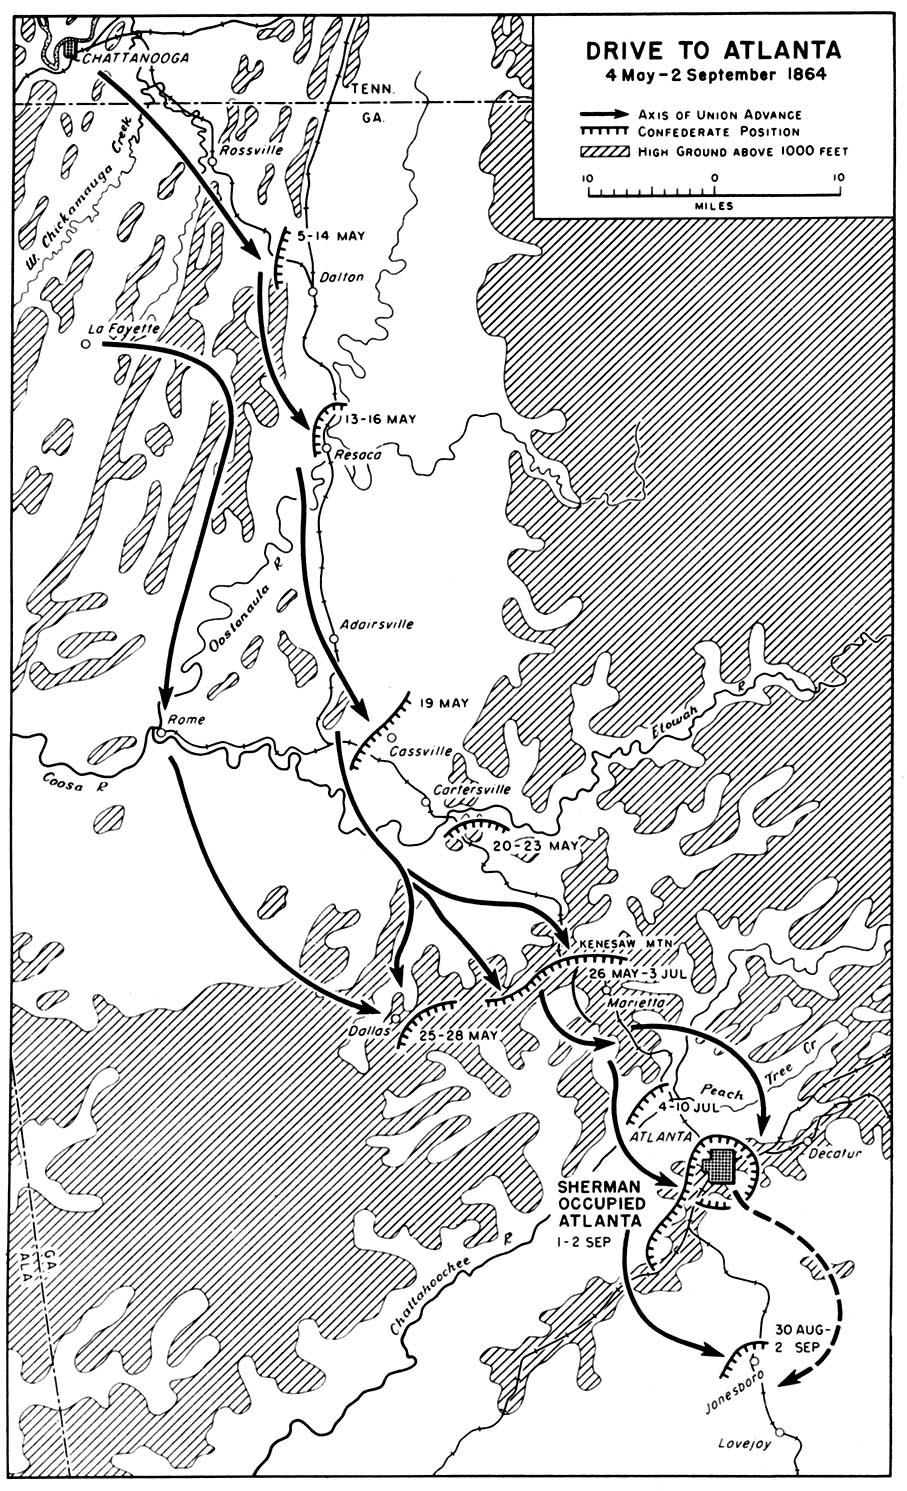 Map of the Drive to Atlanta, American Civil War,  4 May-2 September 1864